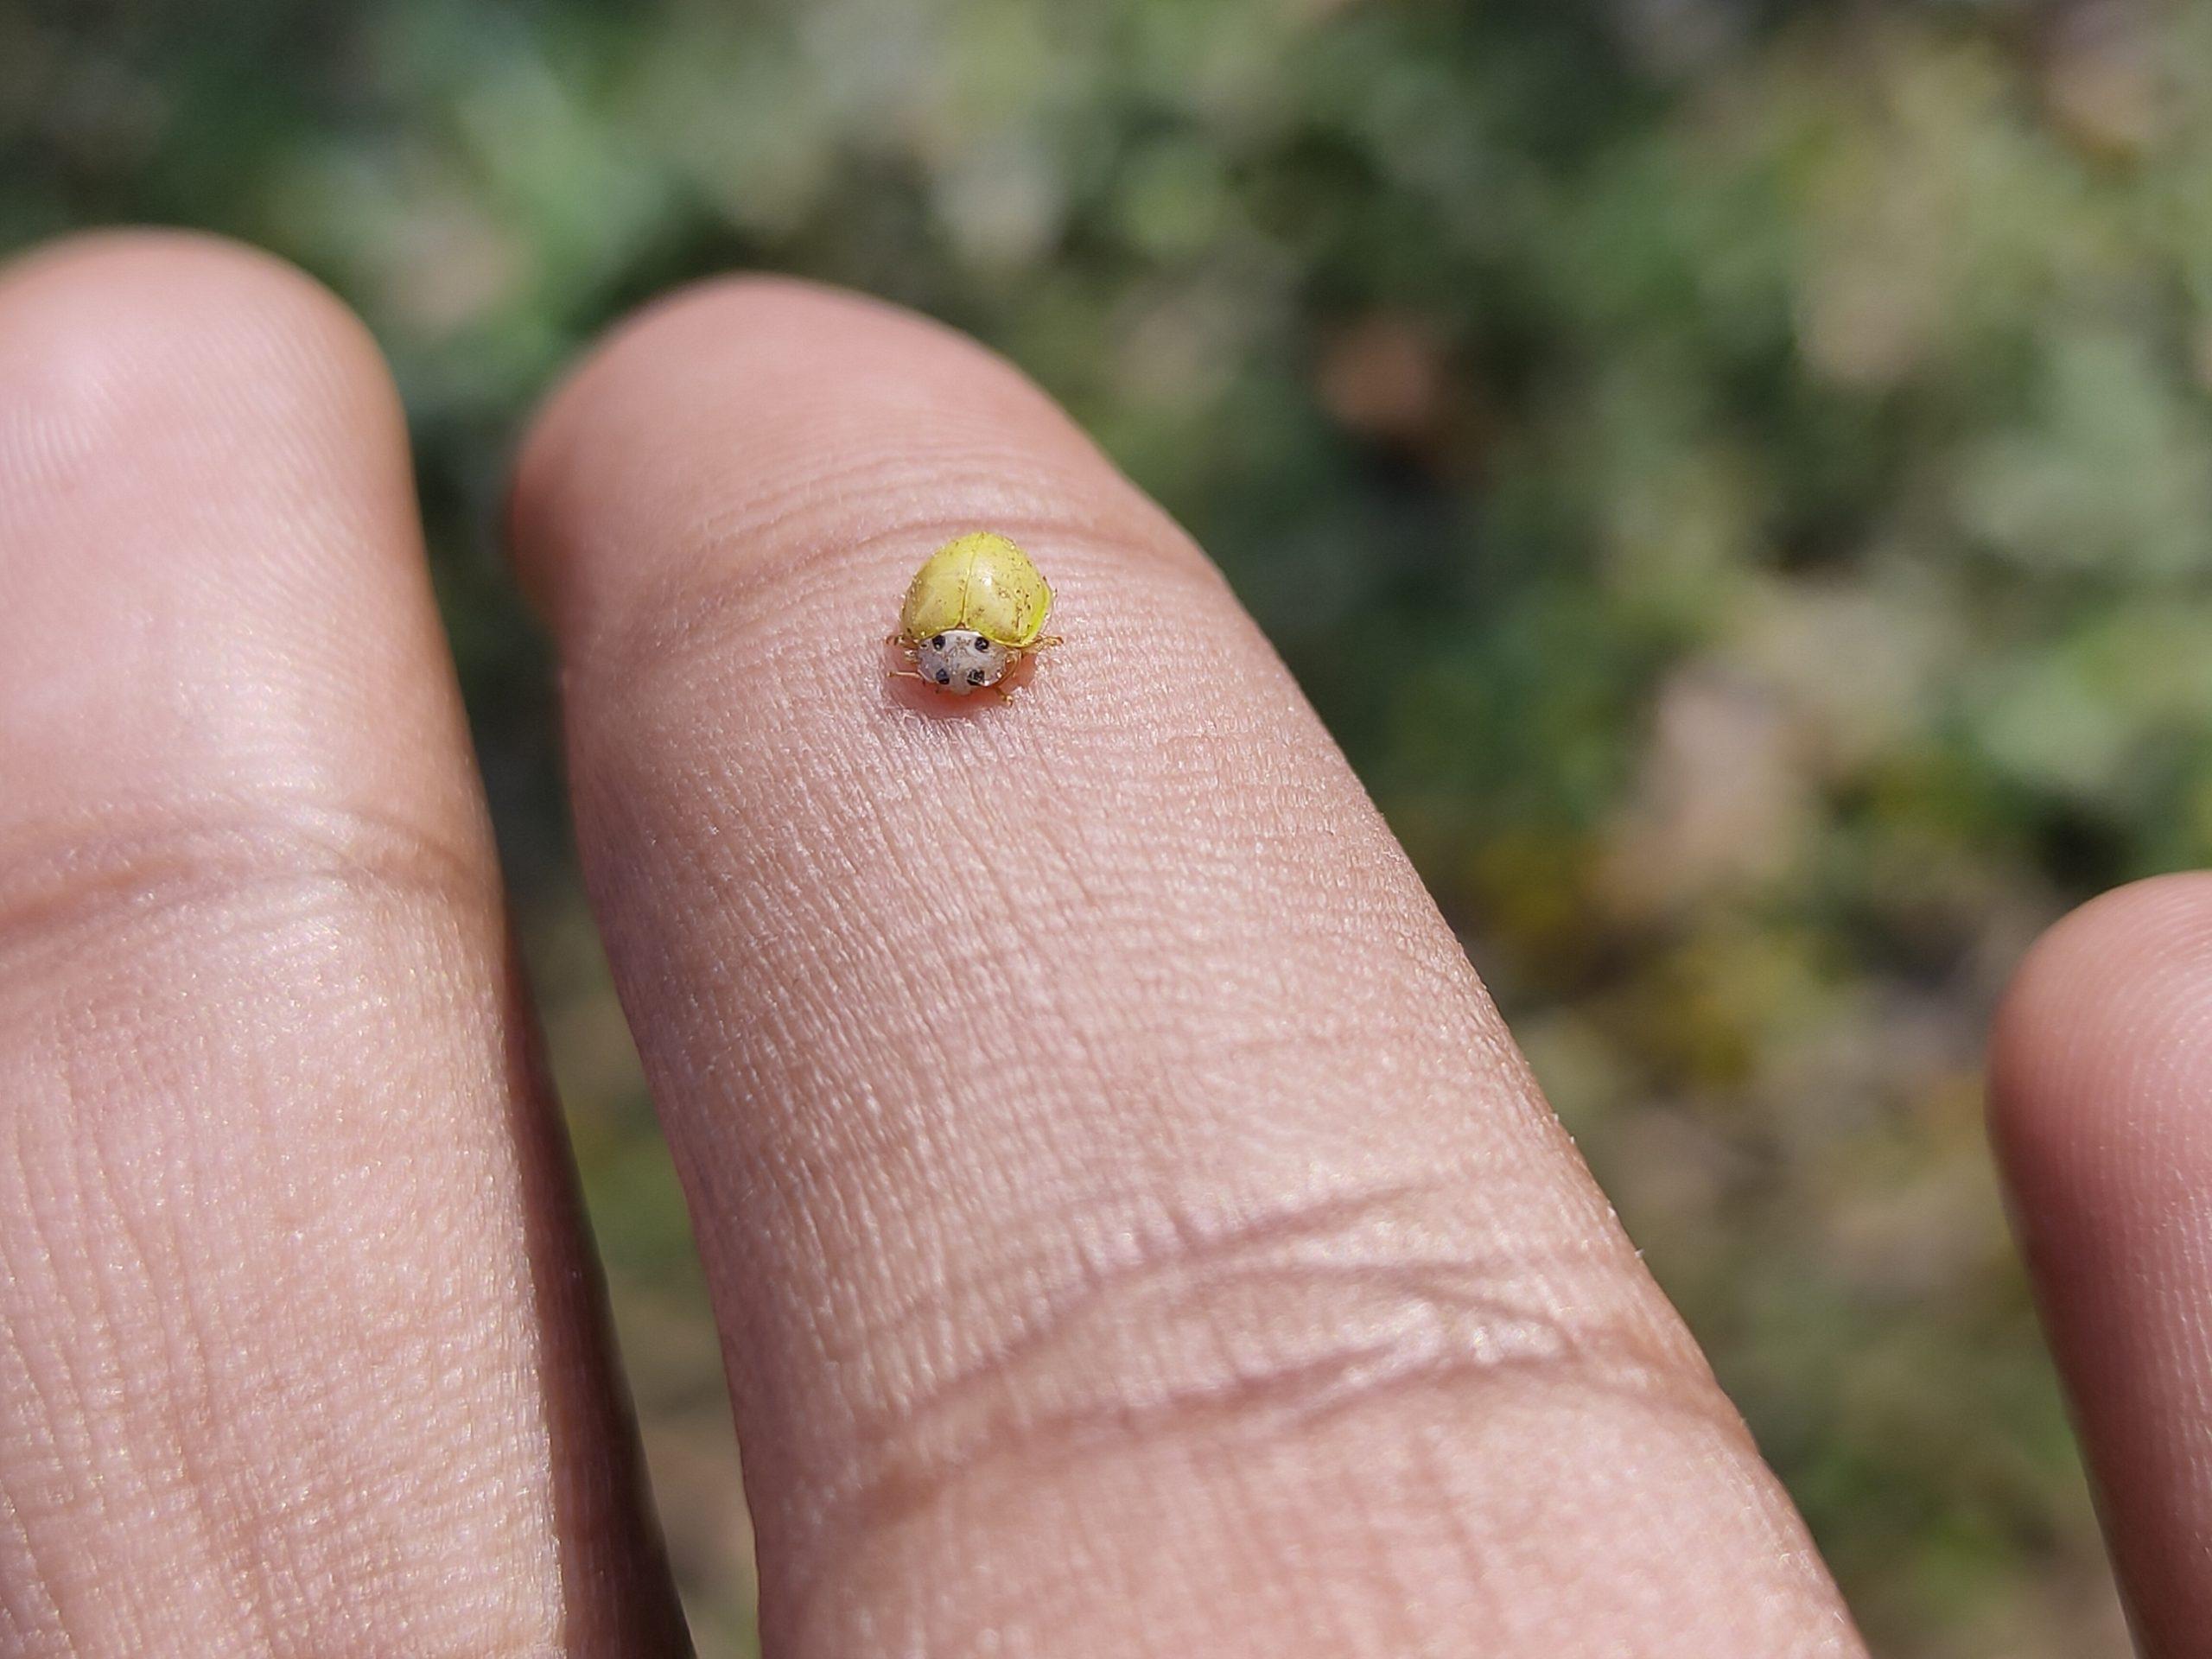 Bug on hand